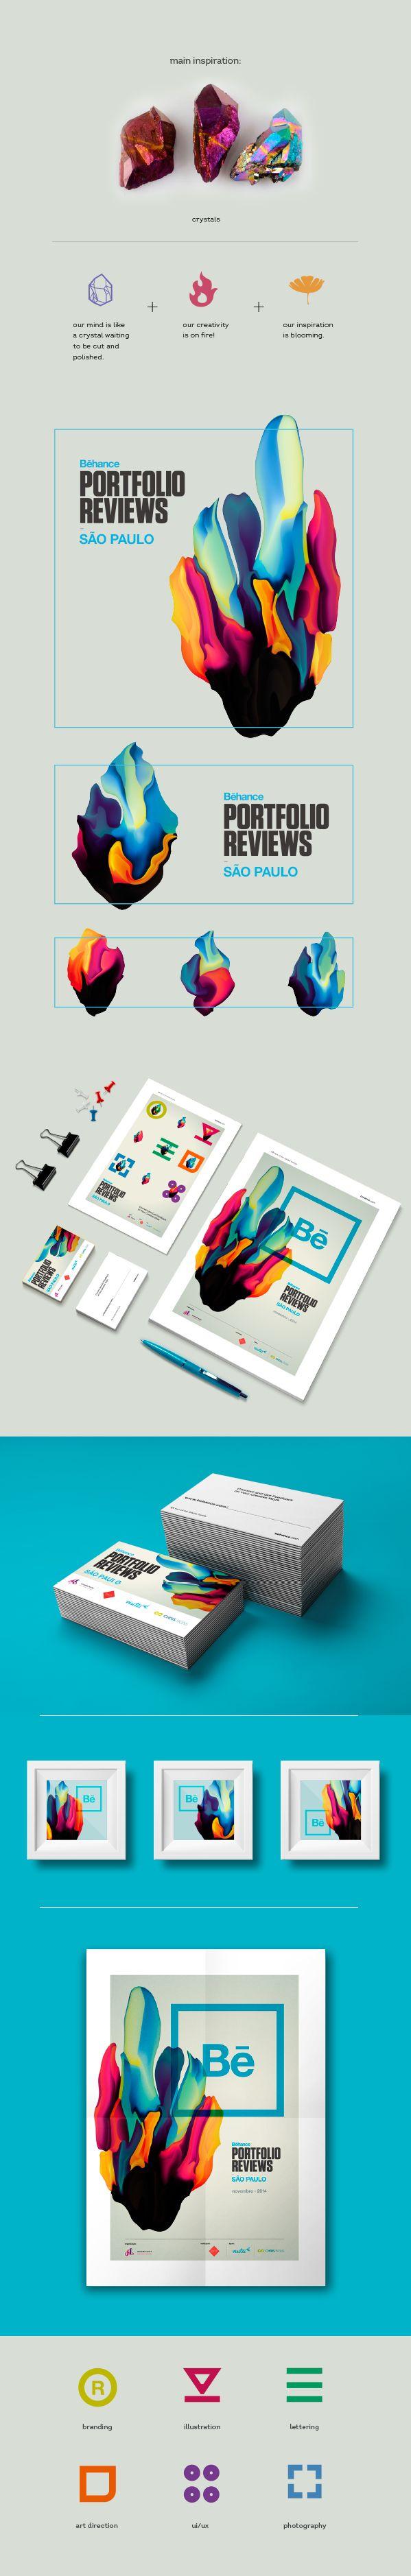 544 best Design & Art images on Pinterest